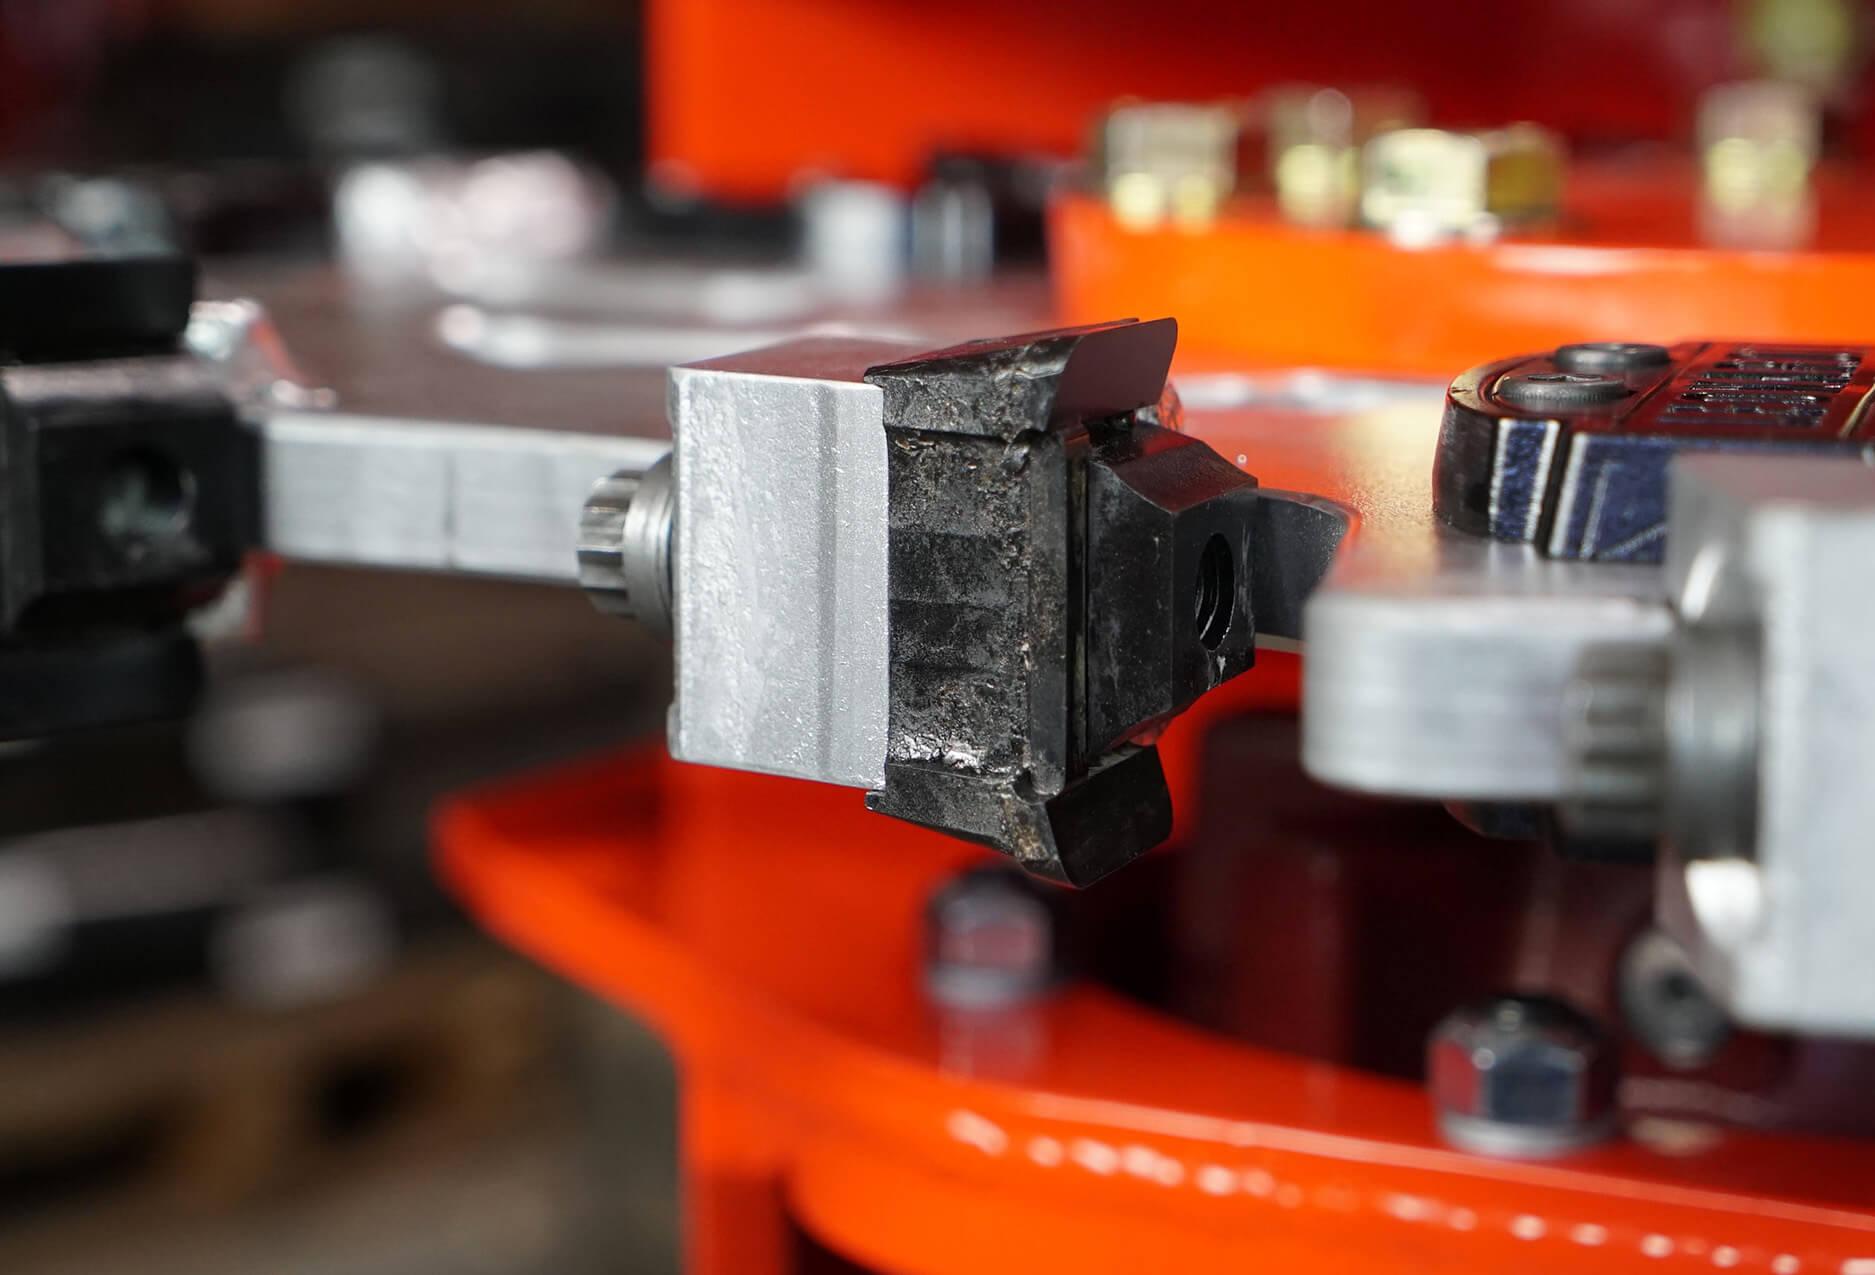 Vortex Skid Steer stump grinder teeth